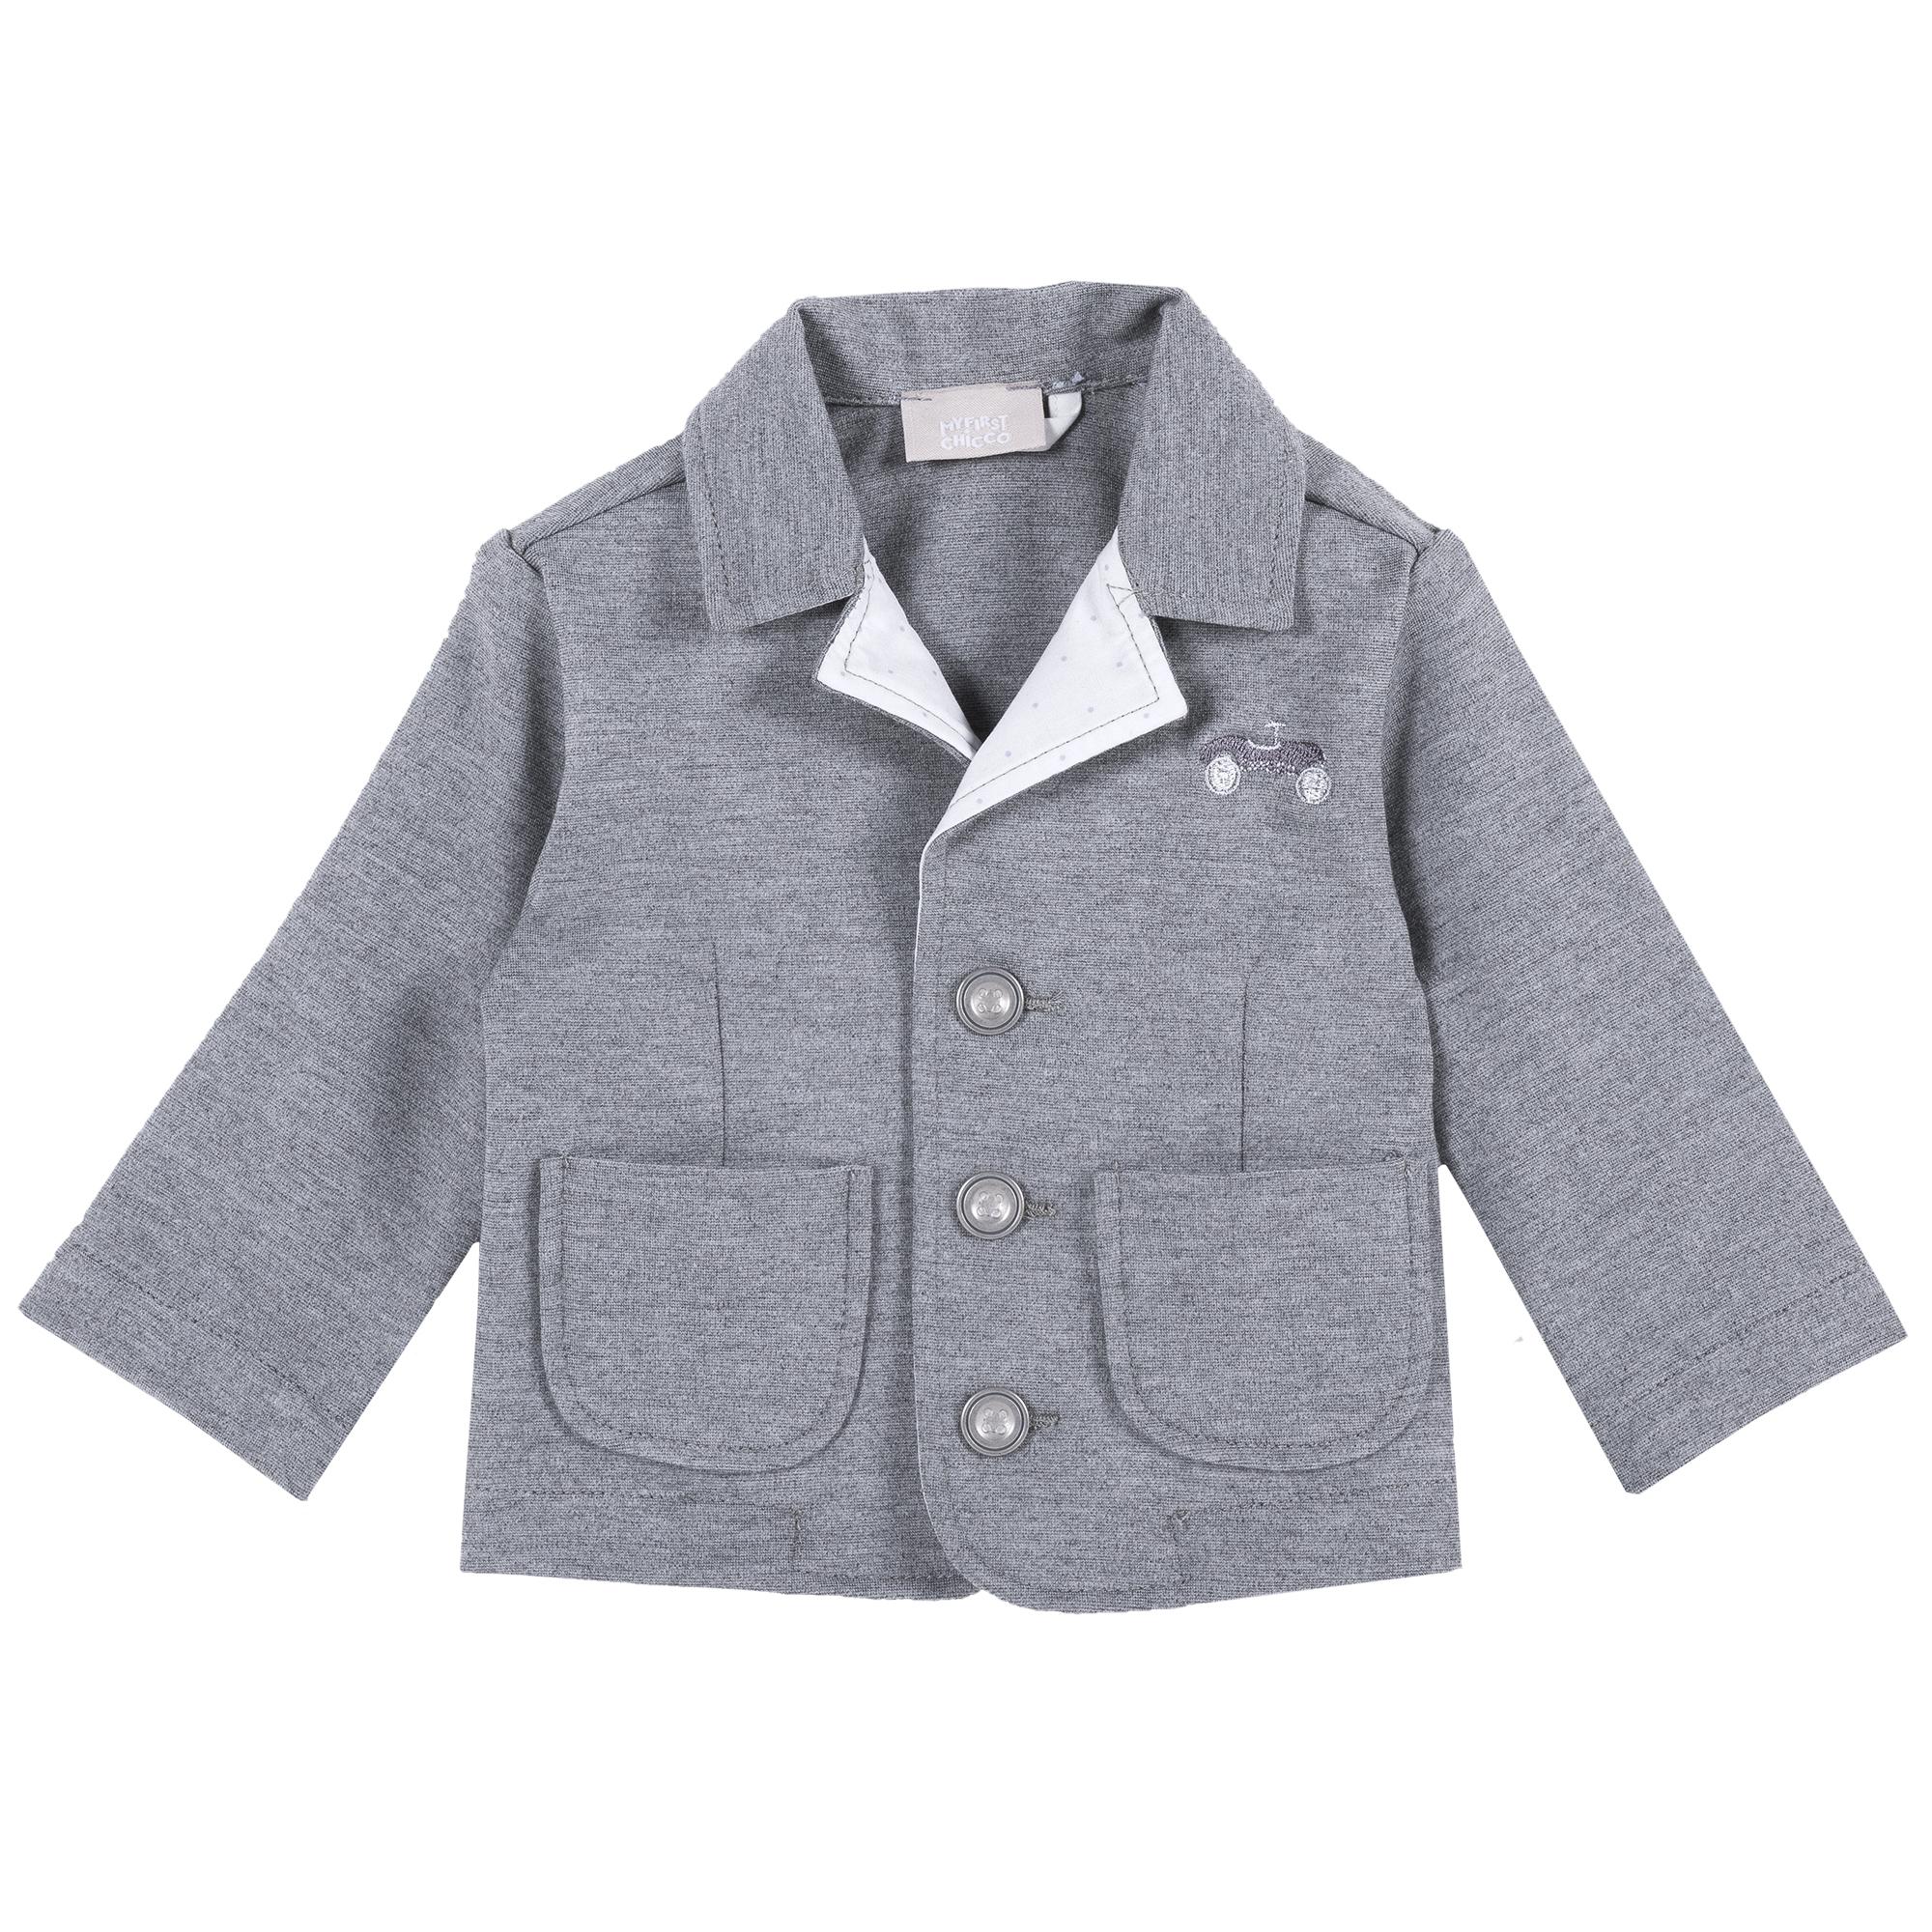 Jacheta copii Chicco, gri inchis